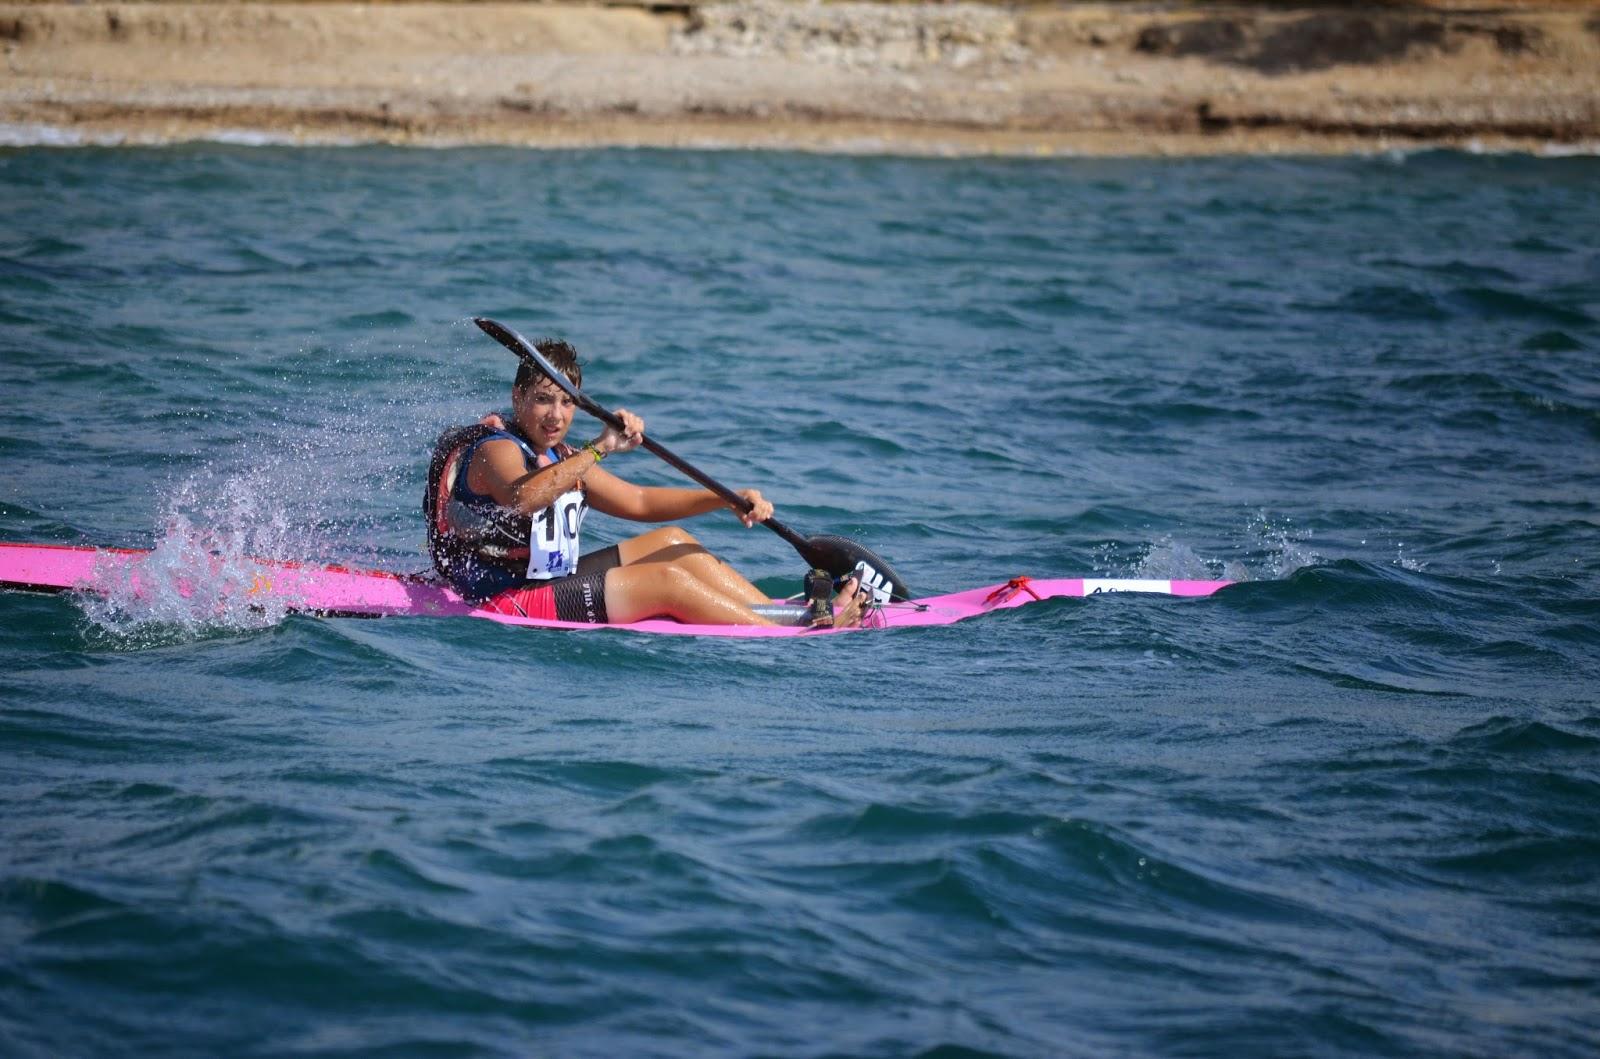 Club pirag isme silla 5 competici n xii liga de surfski for Sillas para kayak